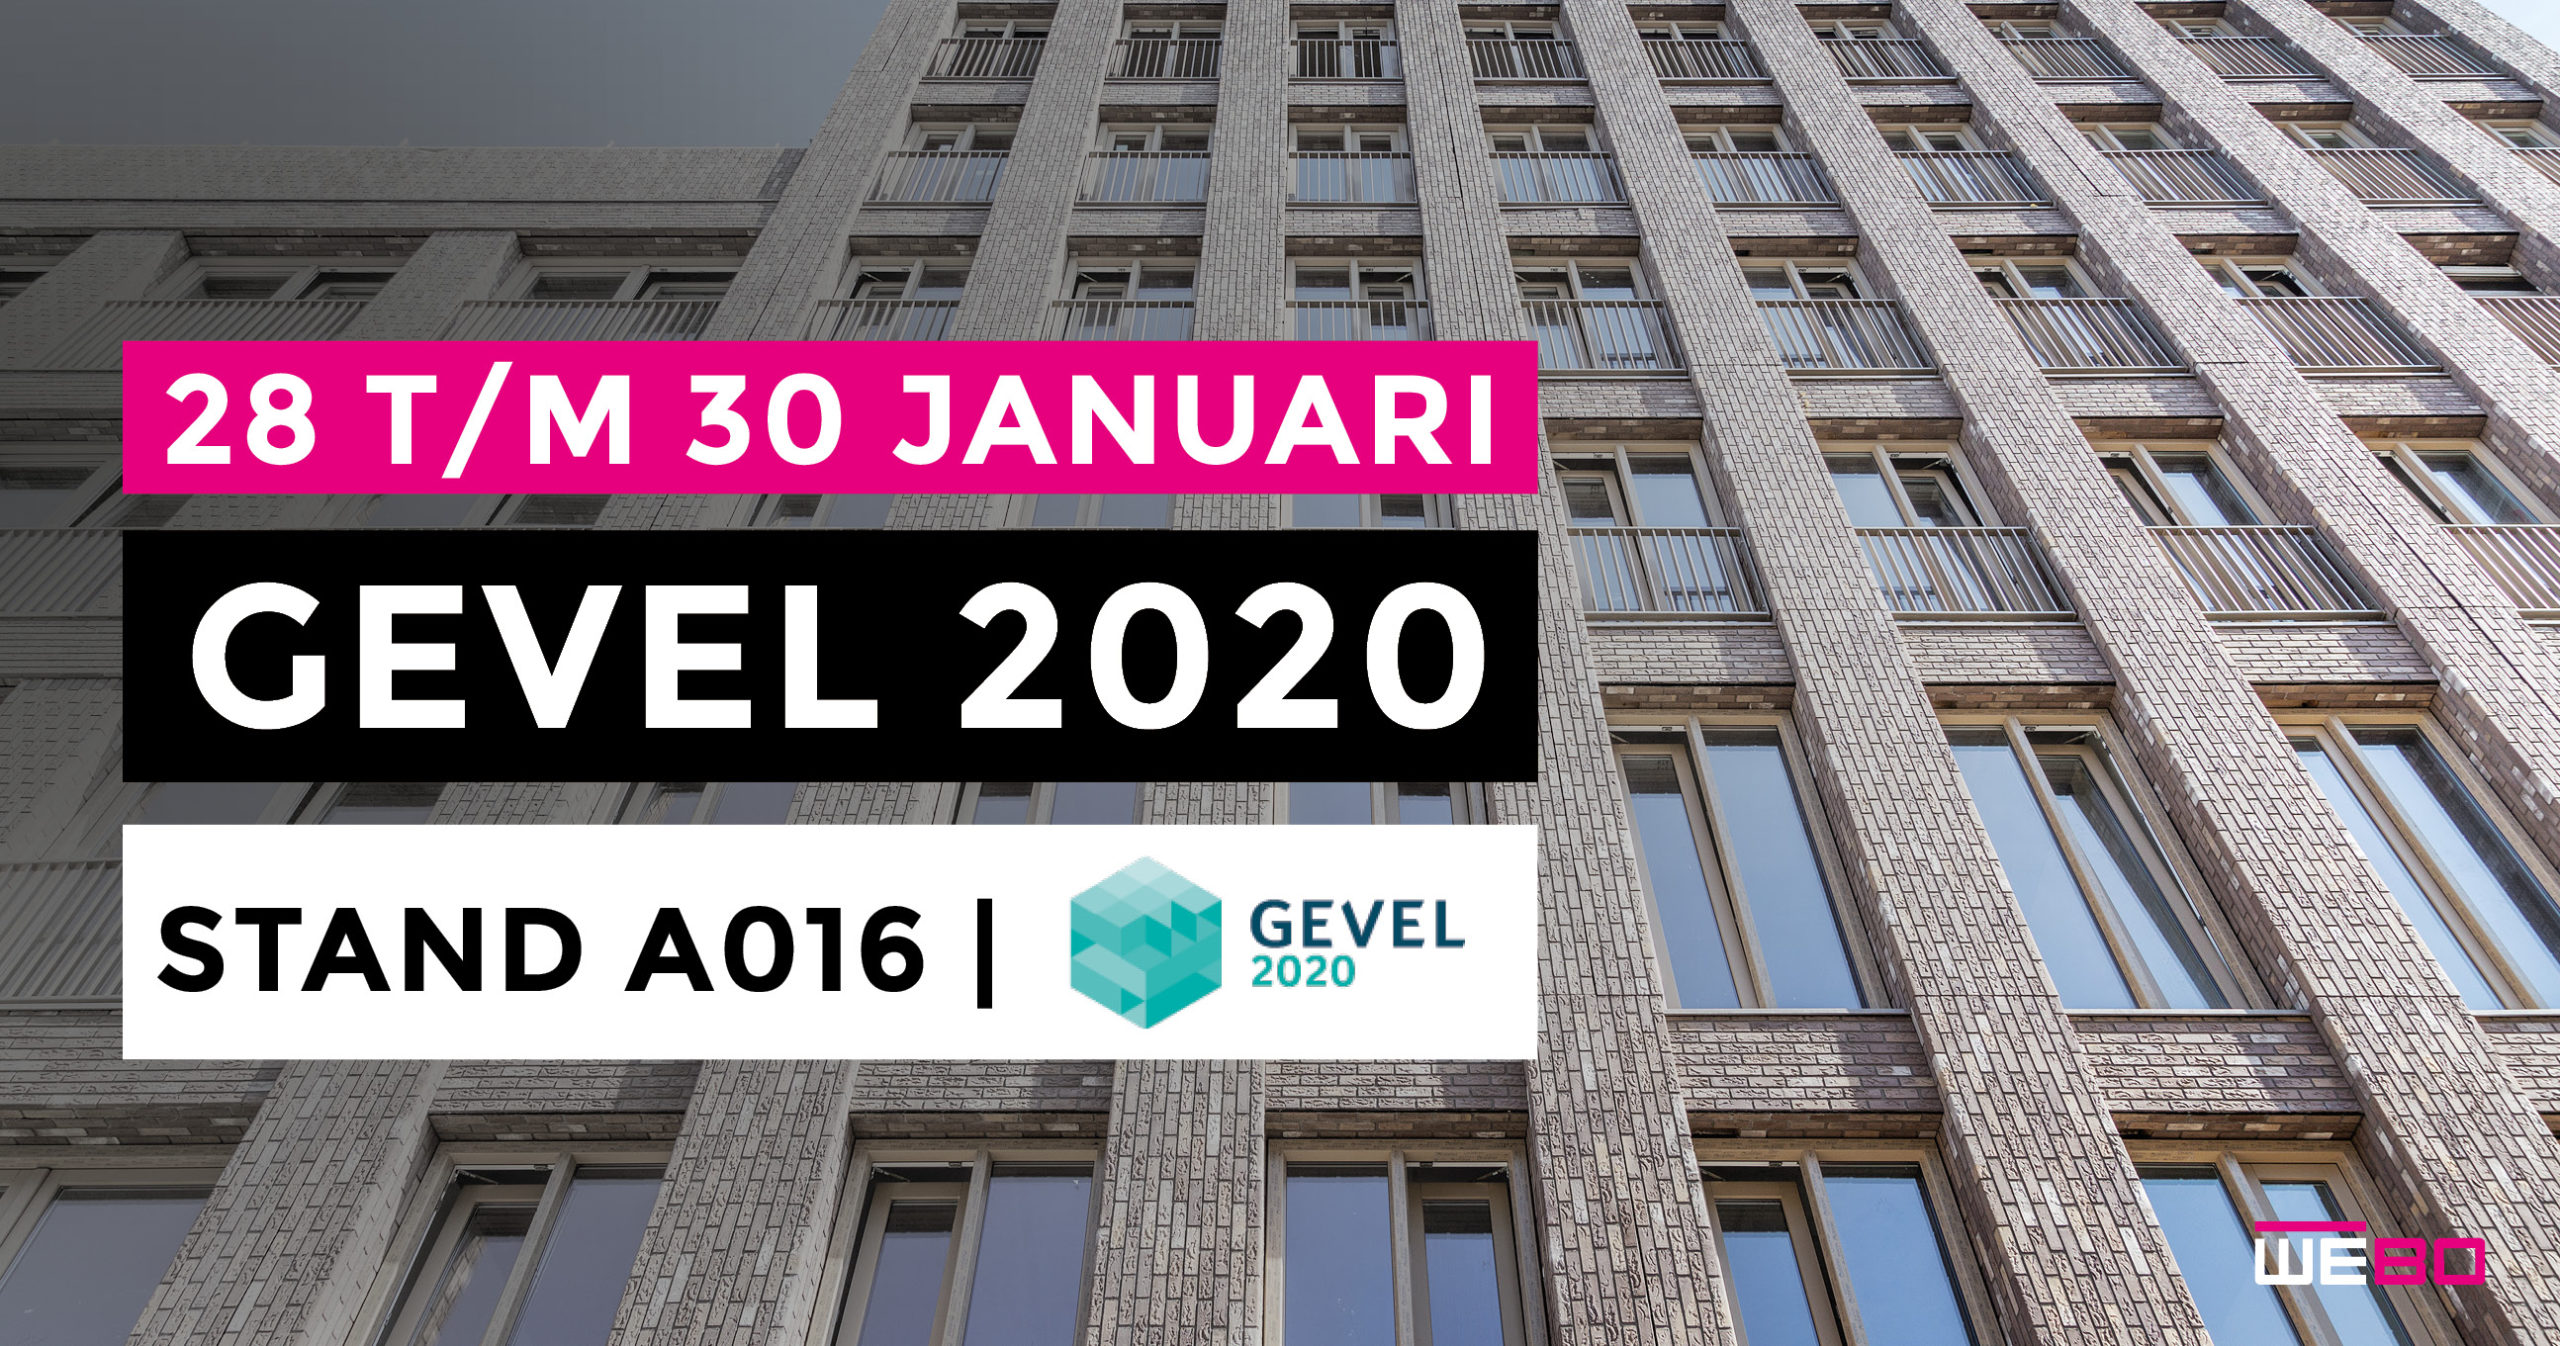 WEBO op GEVEL 2020